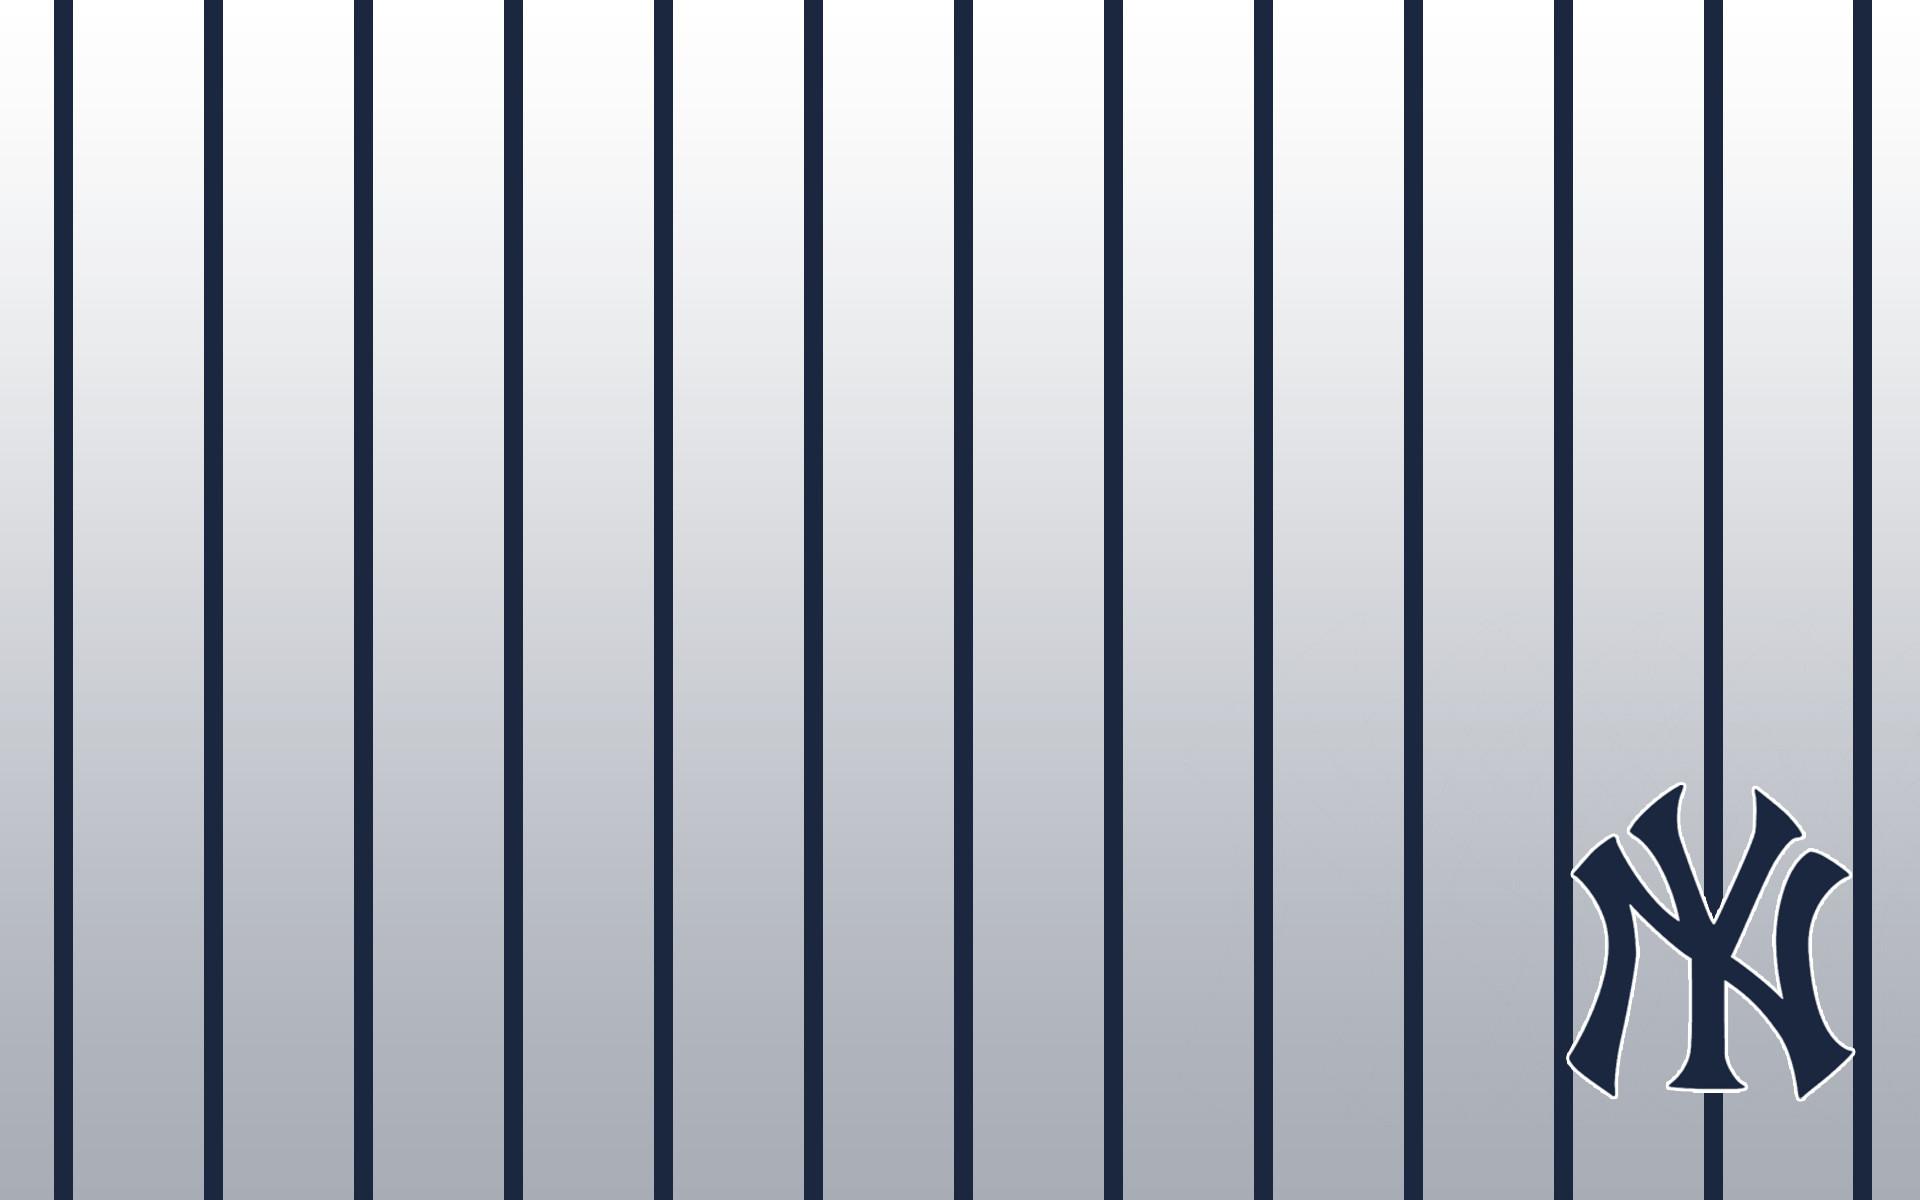 New York Yankees Wallpaper For Iphone 5 New York Yankees Logo Wallpaper 183 ① Wallpapertag